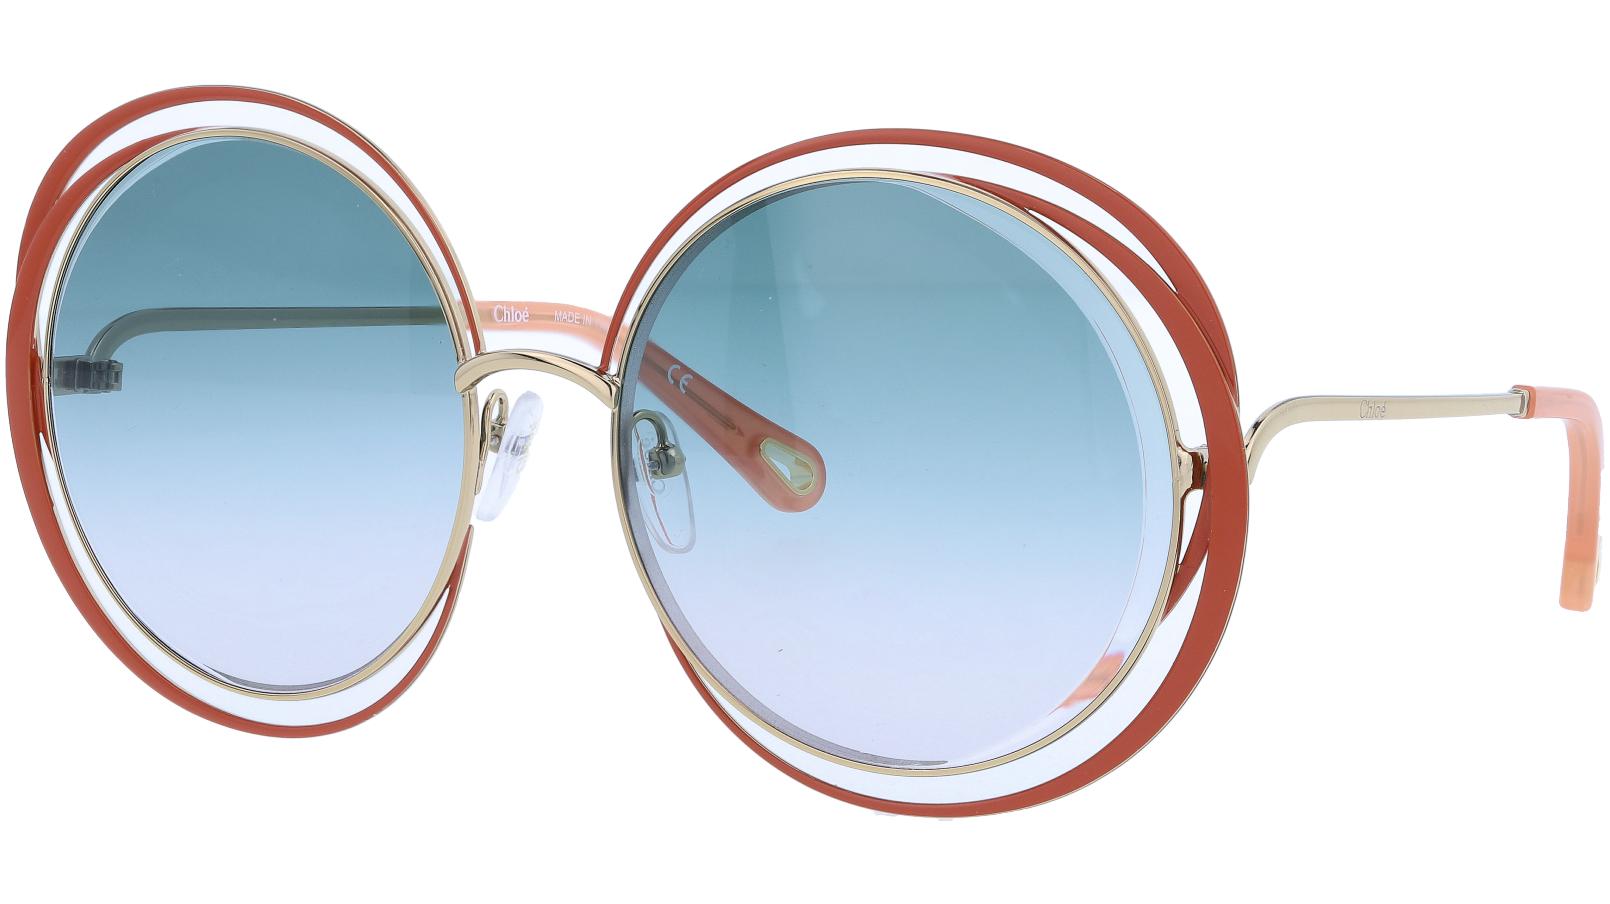 Chloé CE155S 743 59 Gold Brown Carlina Round Sunglasses